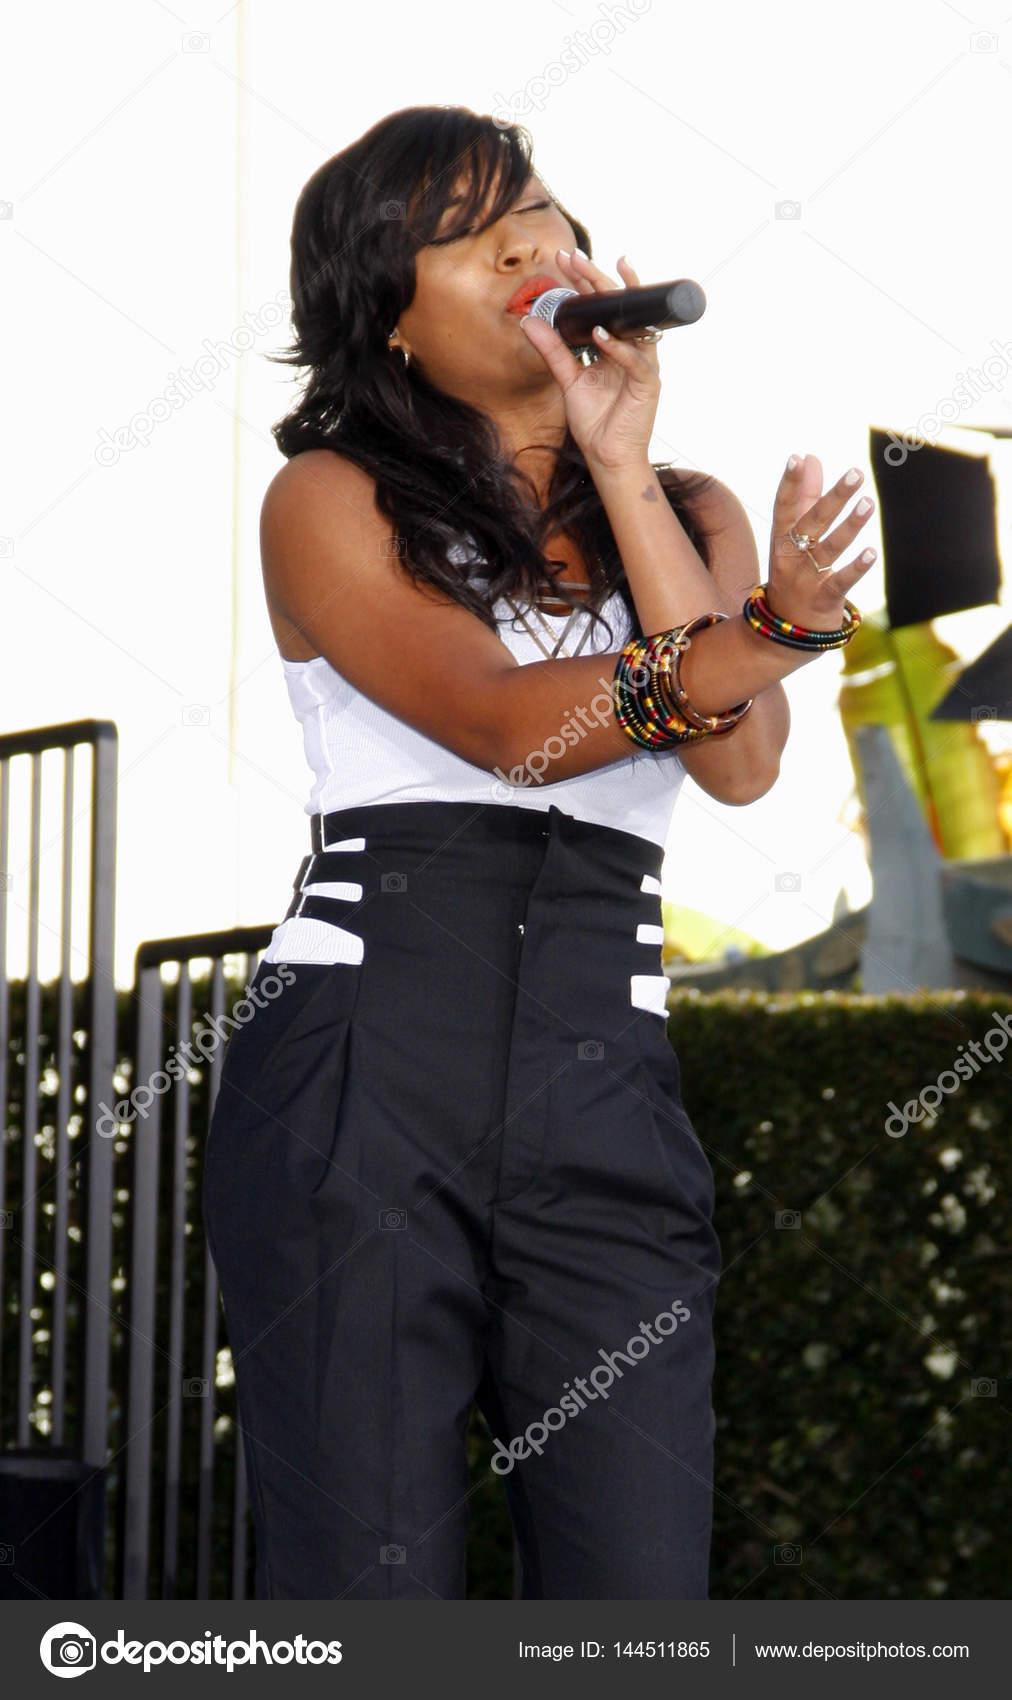 Communication on this topic: Toni Edgar-Bruce, fiona-singer/